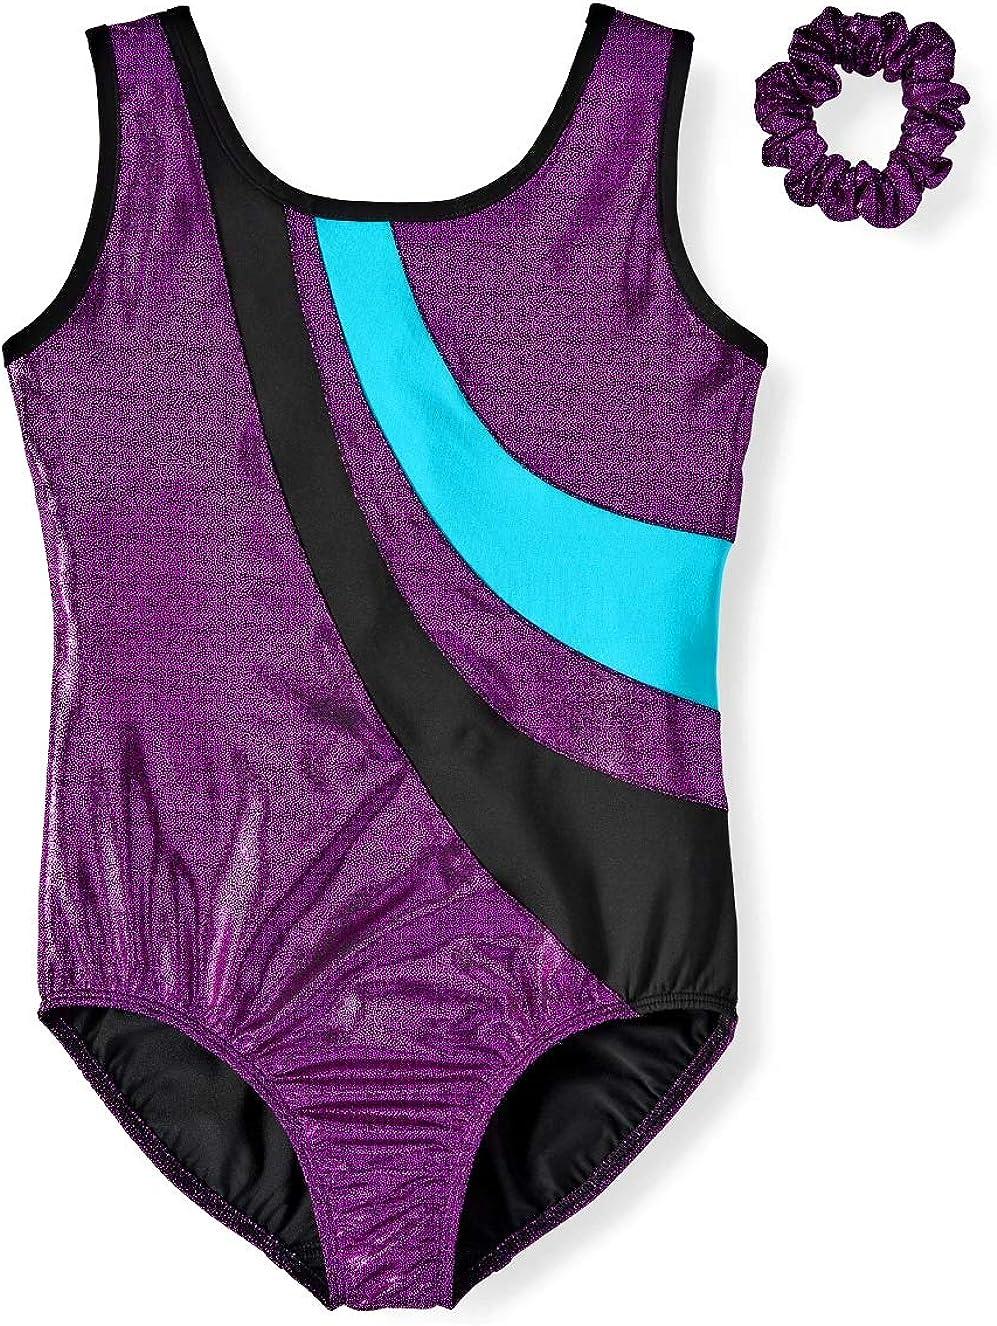 DanskinNow Gymnastics & Dance Elite Foil Leotard with Keyhole Back and Matching Scrunchie (Little Girls & Big Girls)